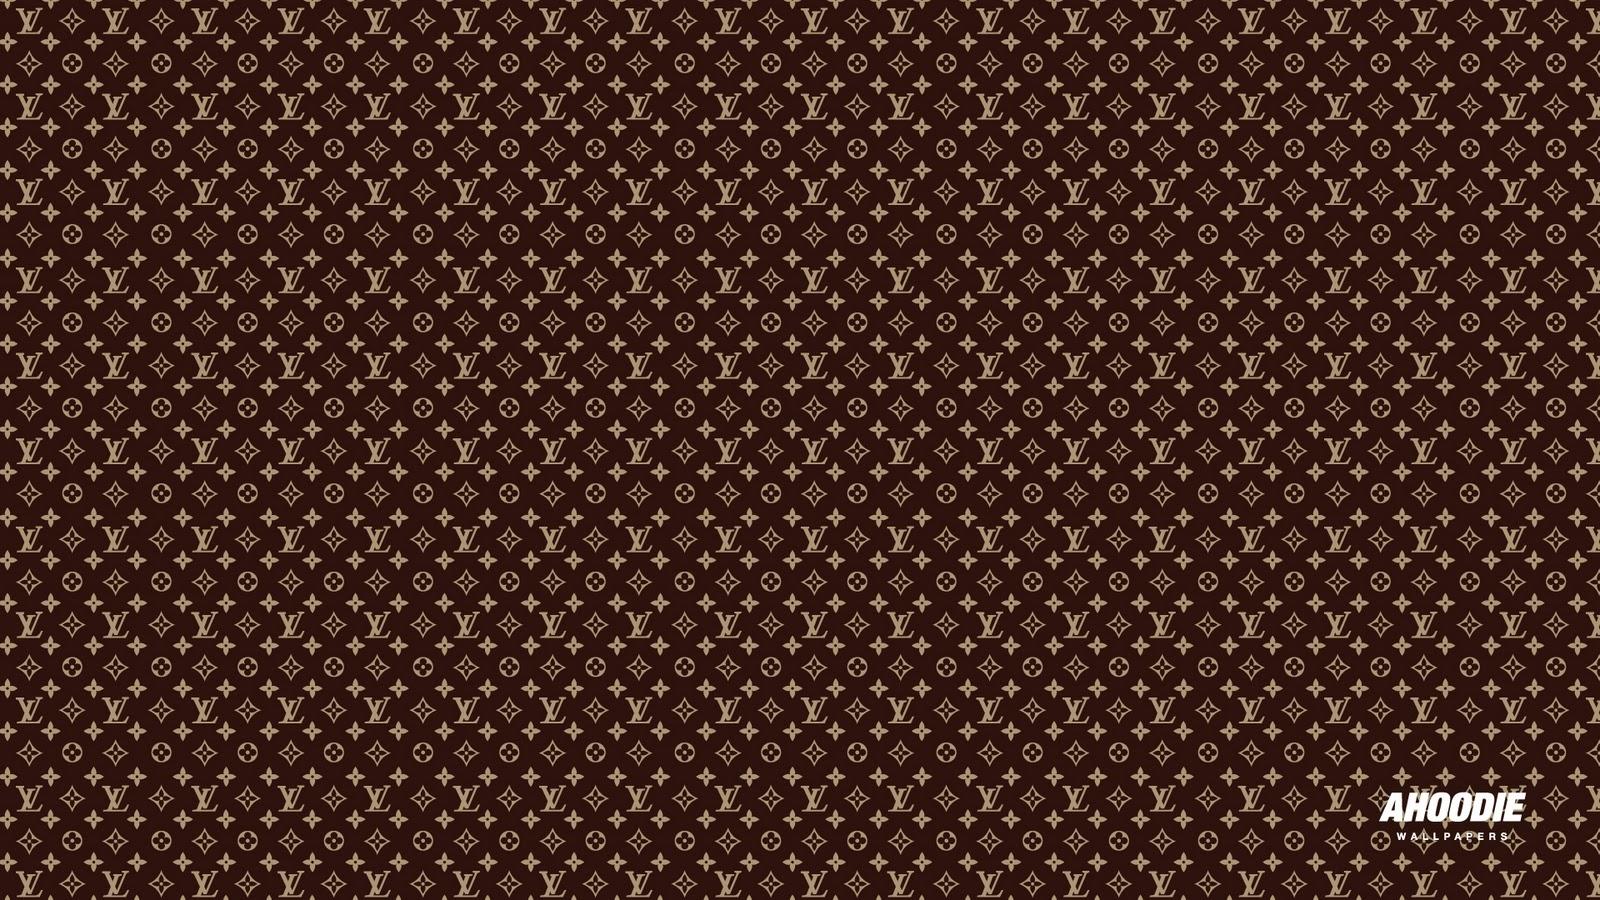 Louis Vuitton Wallpapers HD - WallpaperSafari